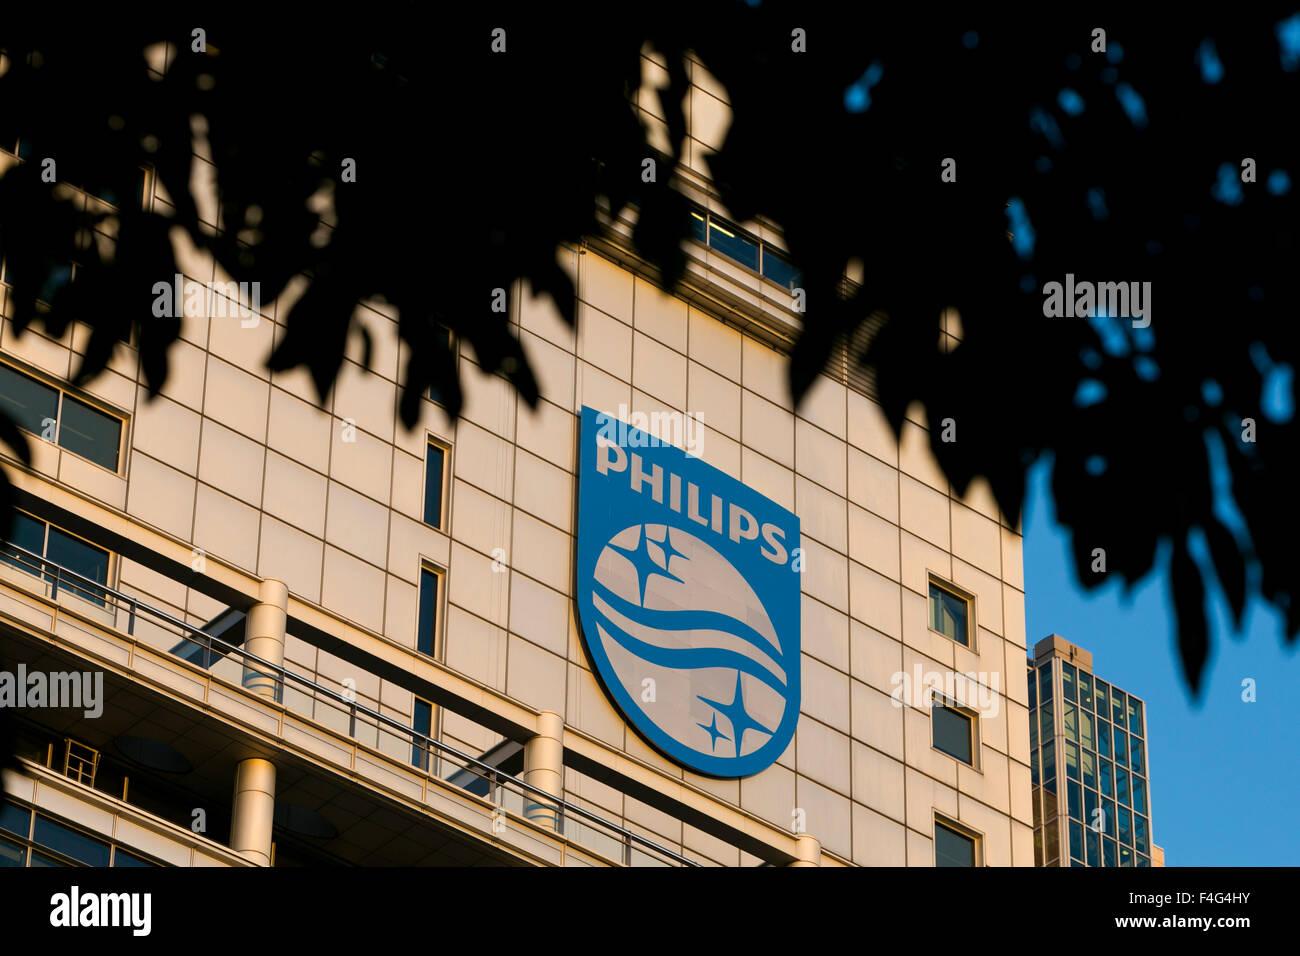 A logo sign outside of the headquarters of Koninklijke Philips N.V. in Amsterdam, Netherlands on October 2, 2015. - Stock Image